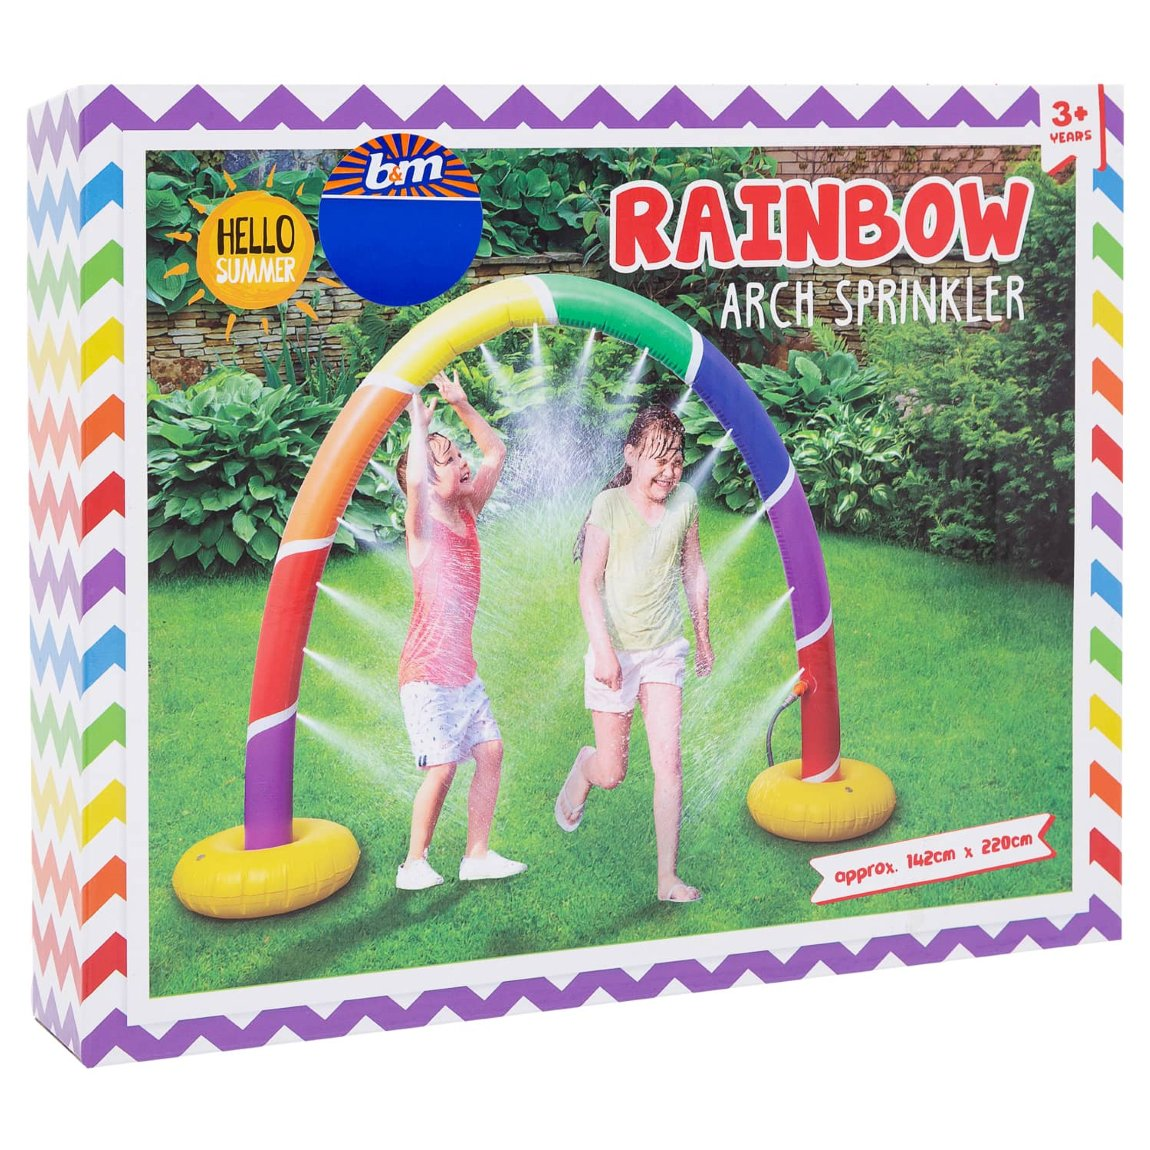 Garden Rainbow Arch Sprinkler From B&M Toys